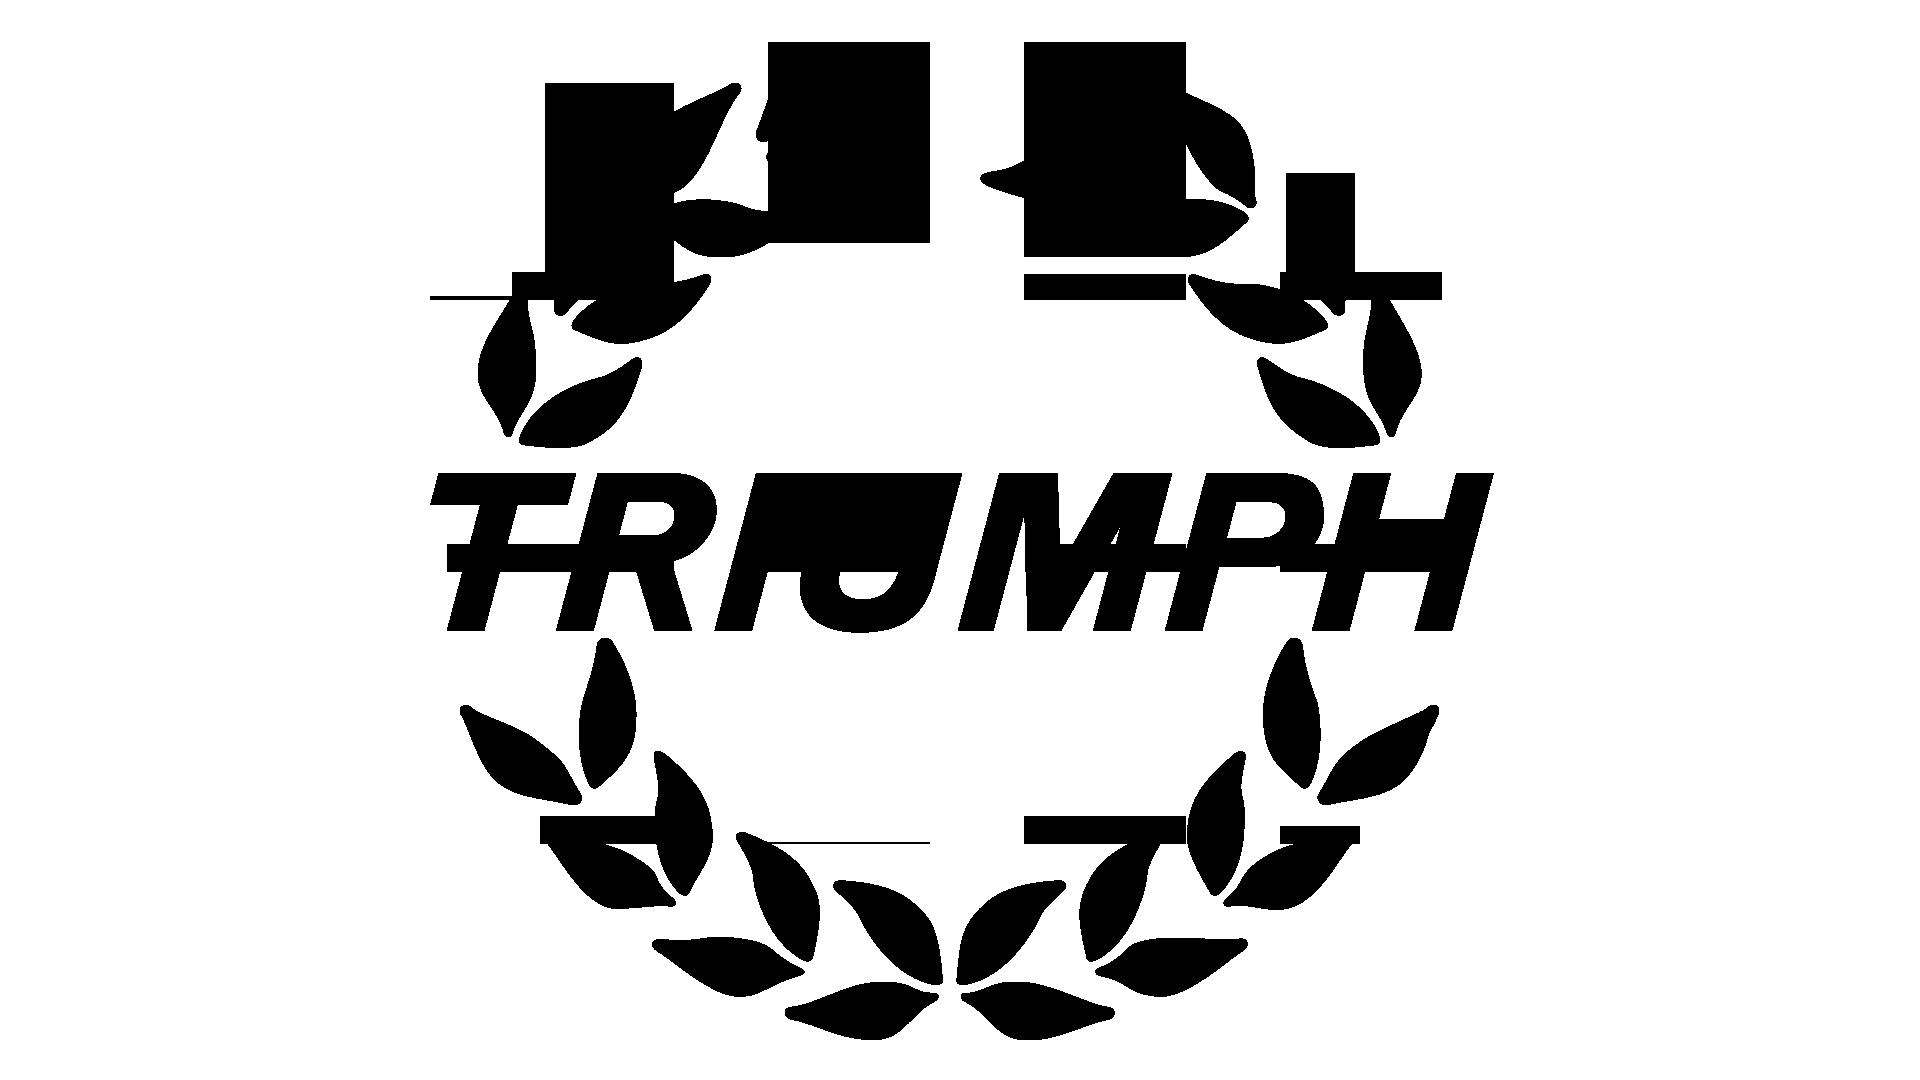 triumph logo hd png information carlogosorg